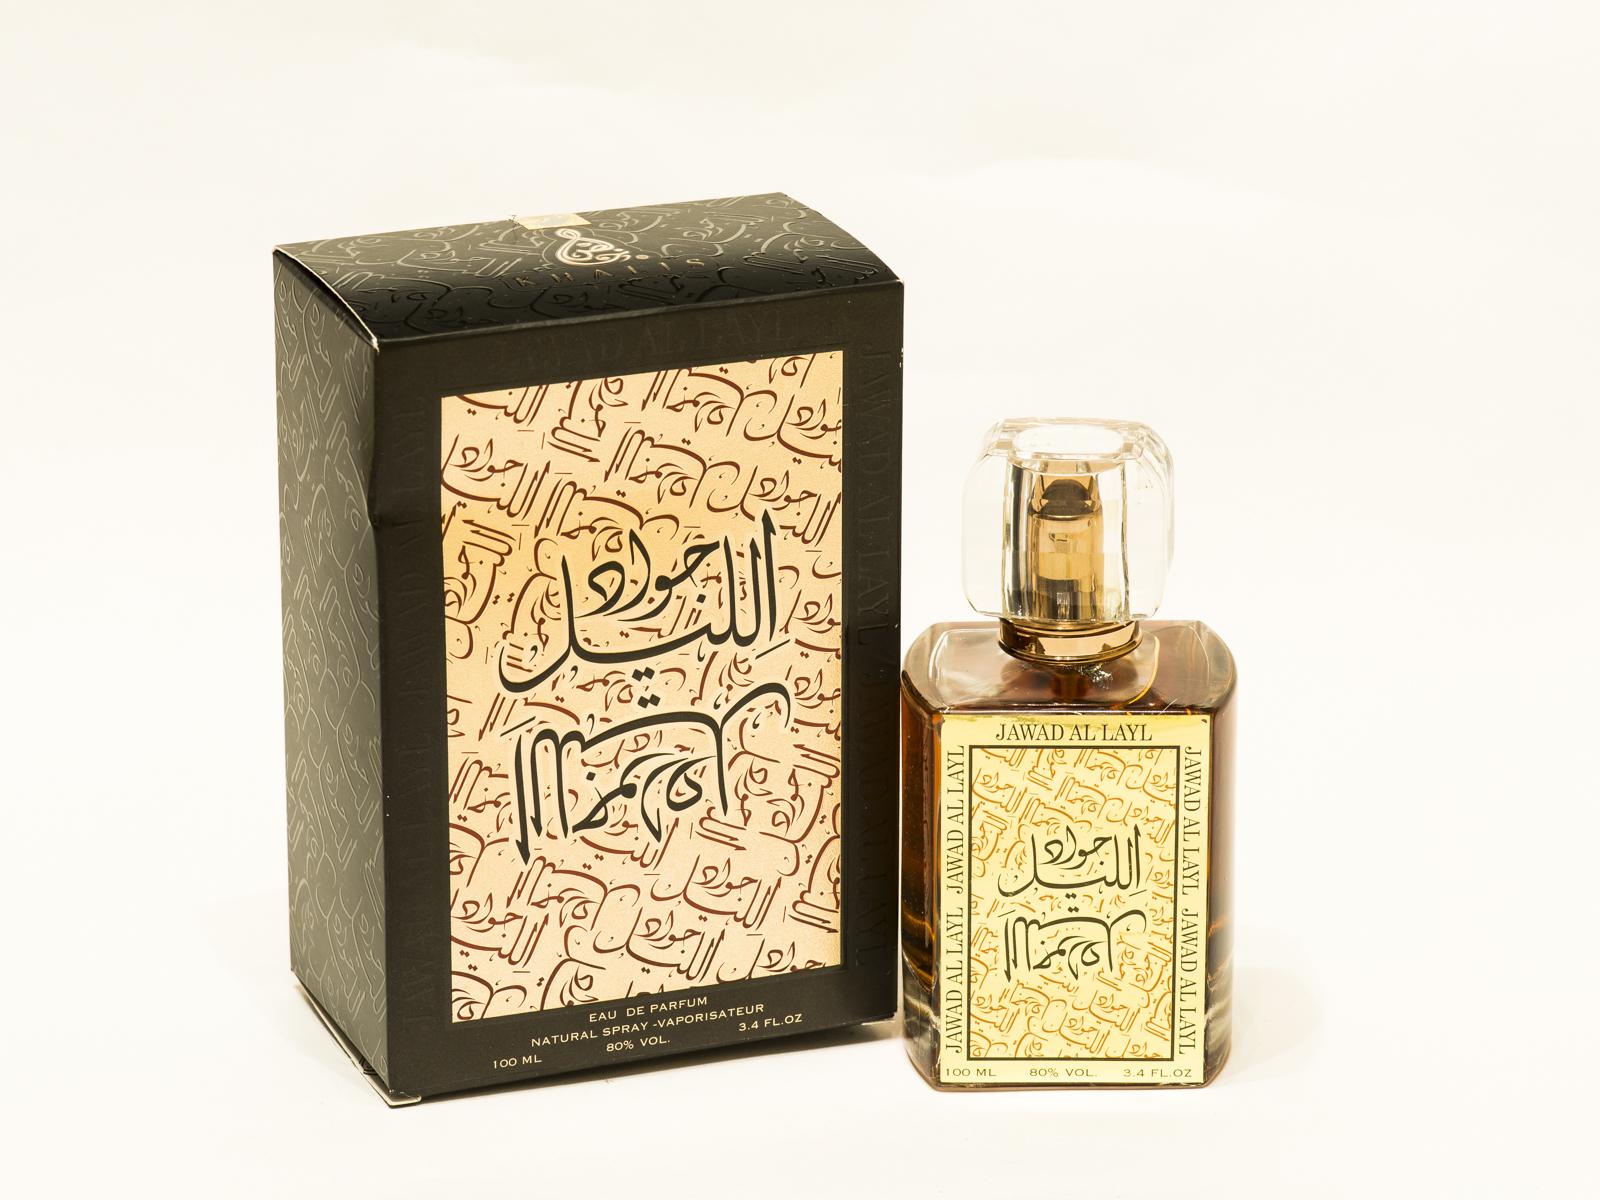 Jawad Al Layl Джавад Аль Лайл 100 мл парфюмированная вода от Халис Khalis Perfumes